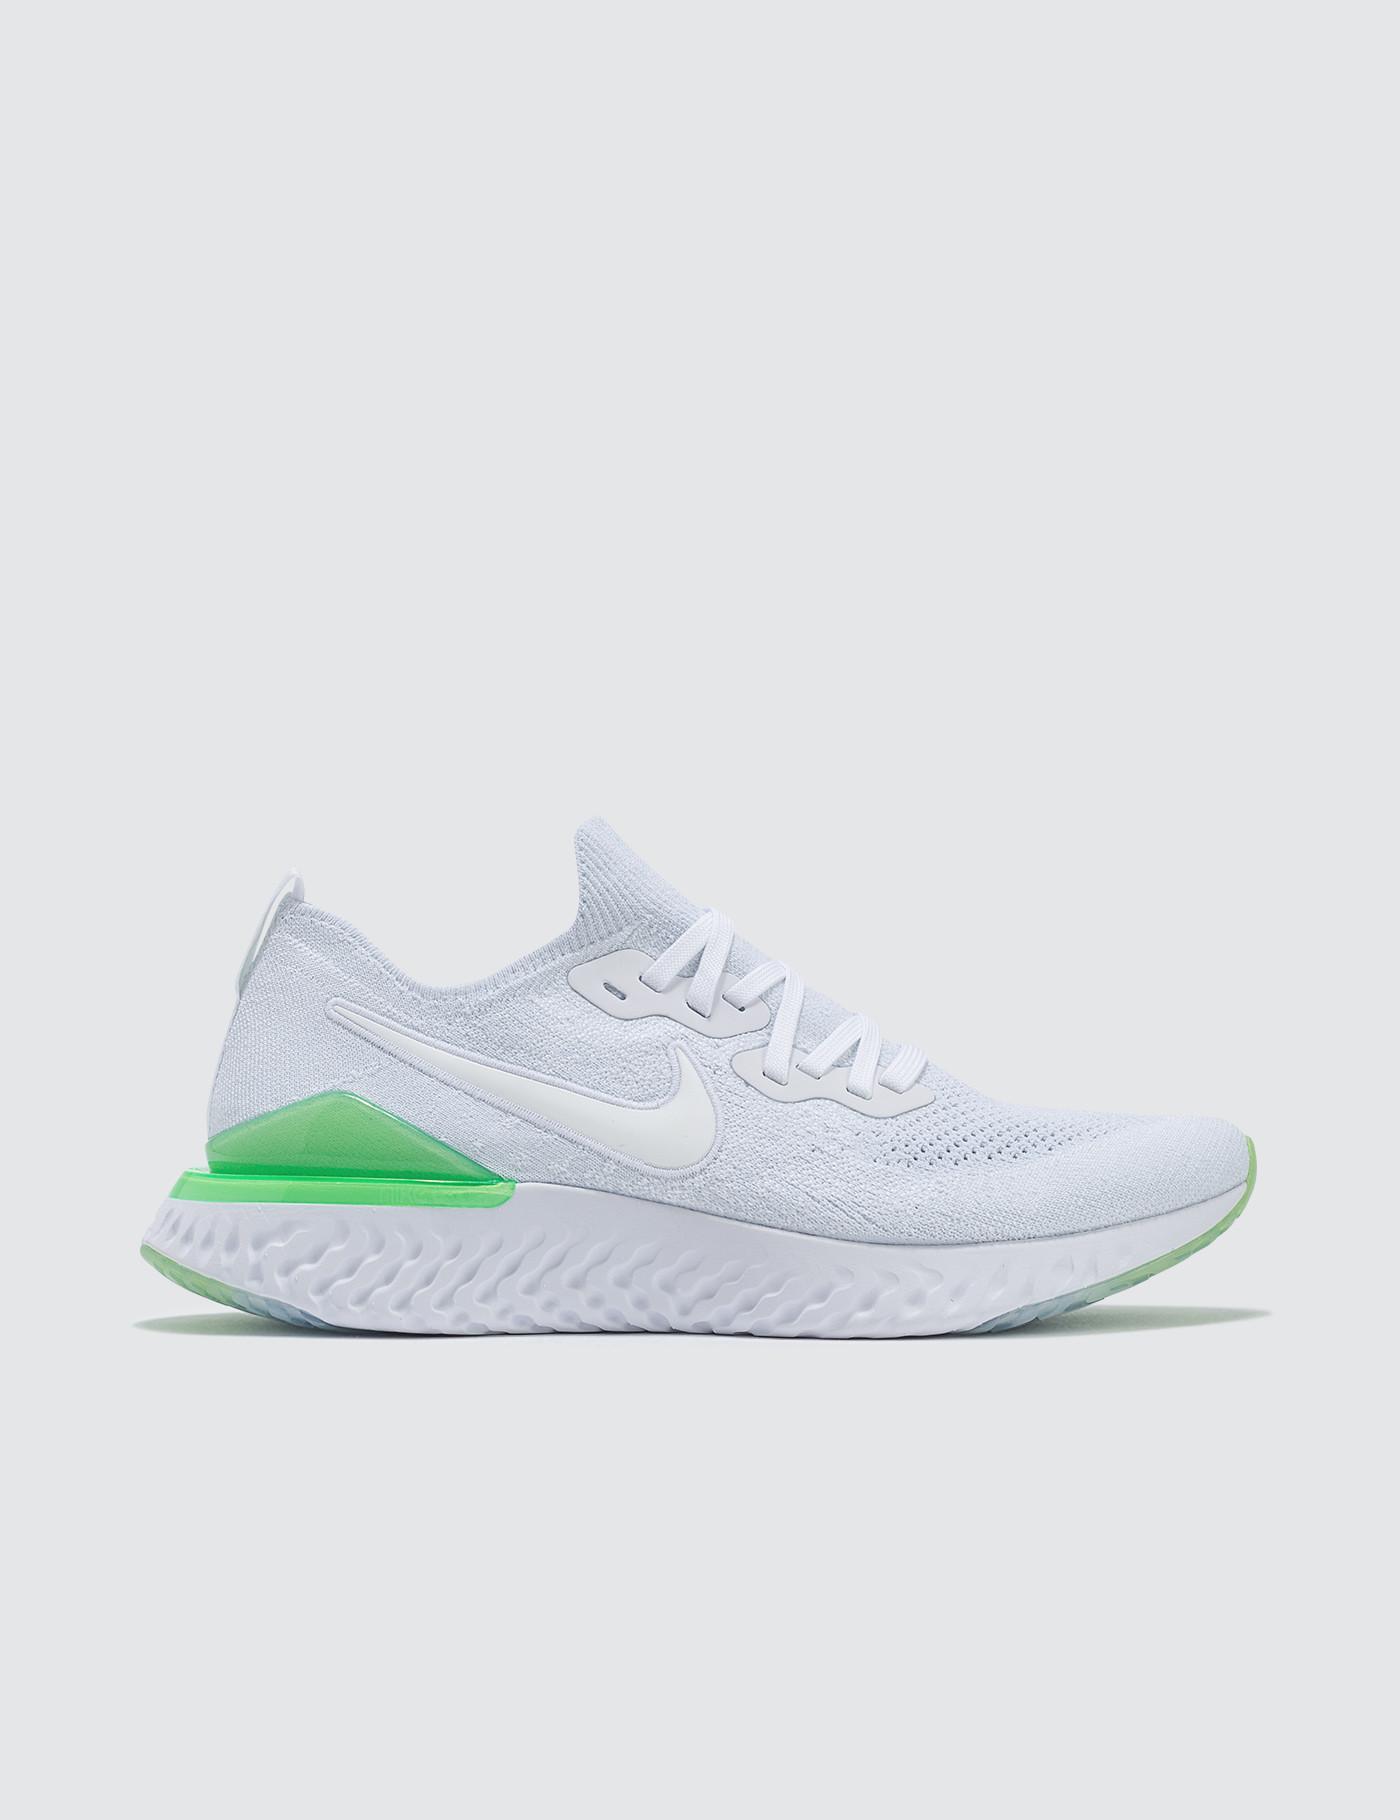 8d2f3d015936 Nike Epic React Flyknit 2 in White for Men - Lyst